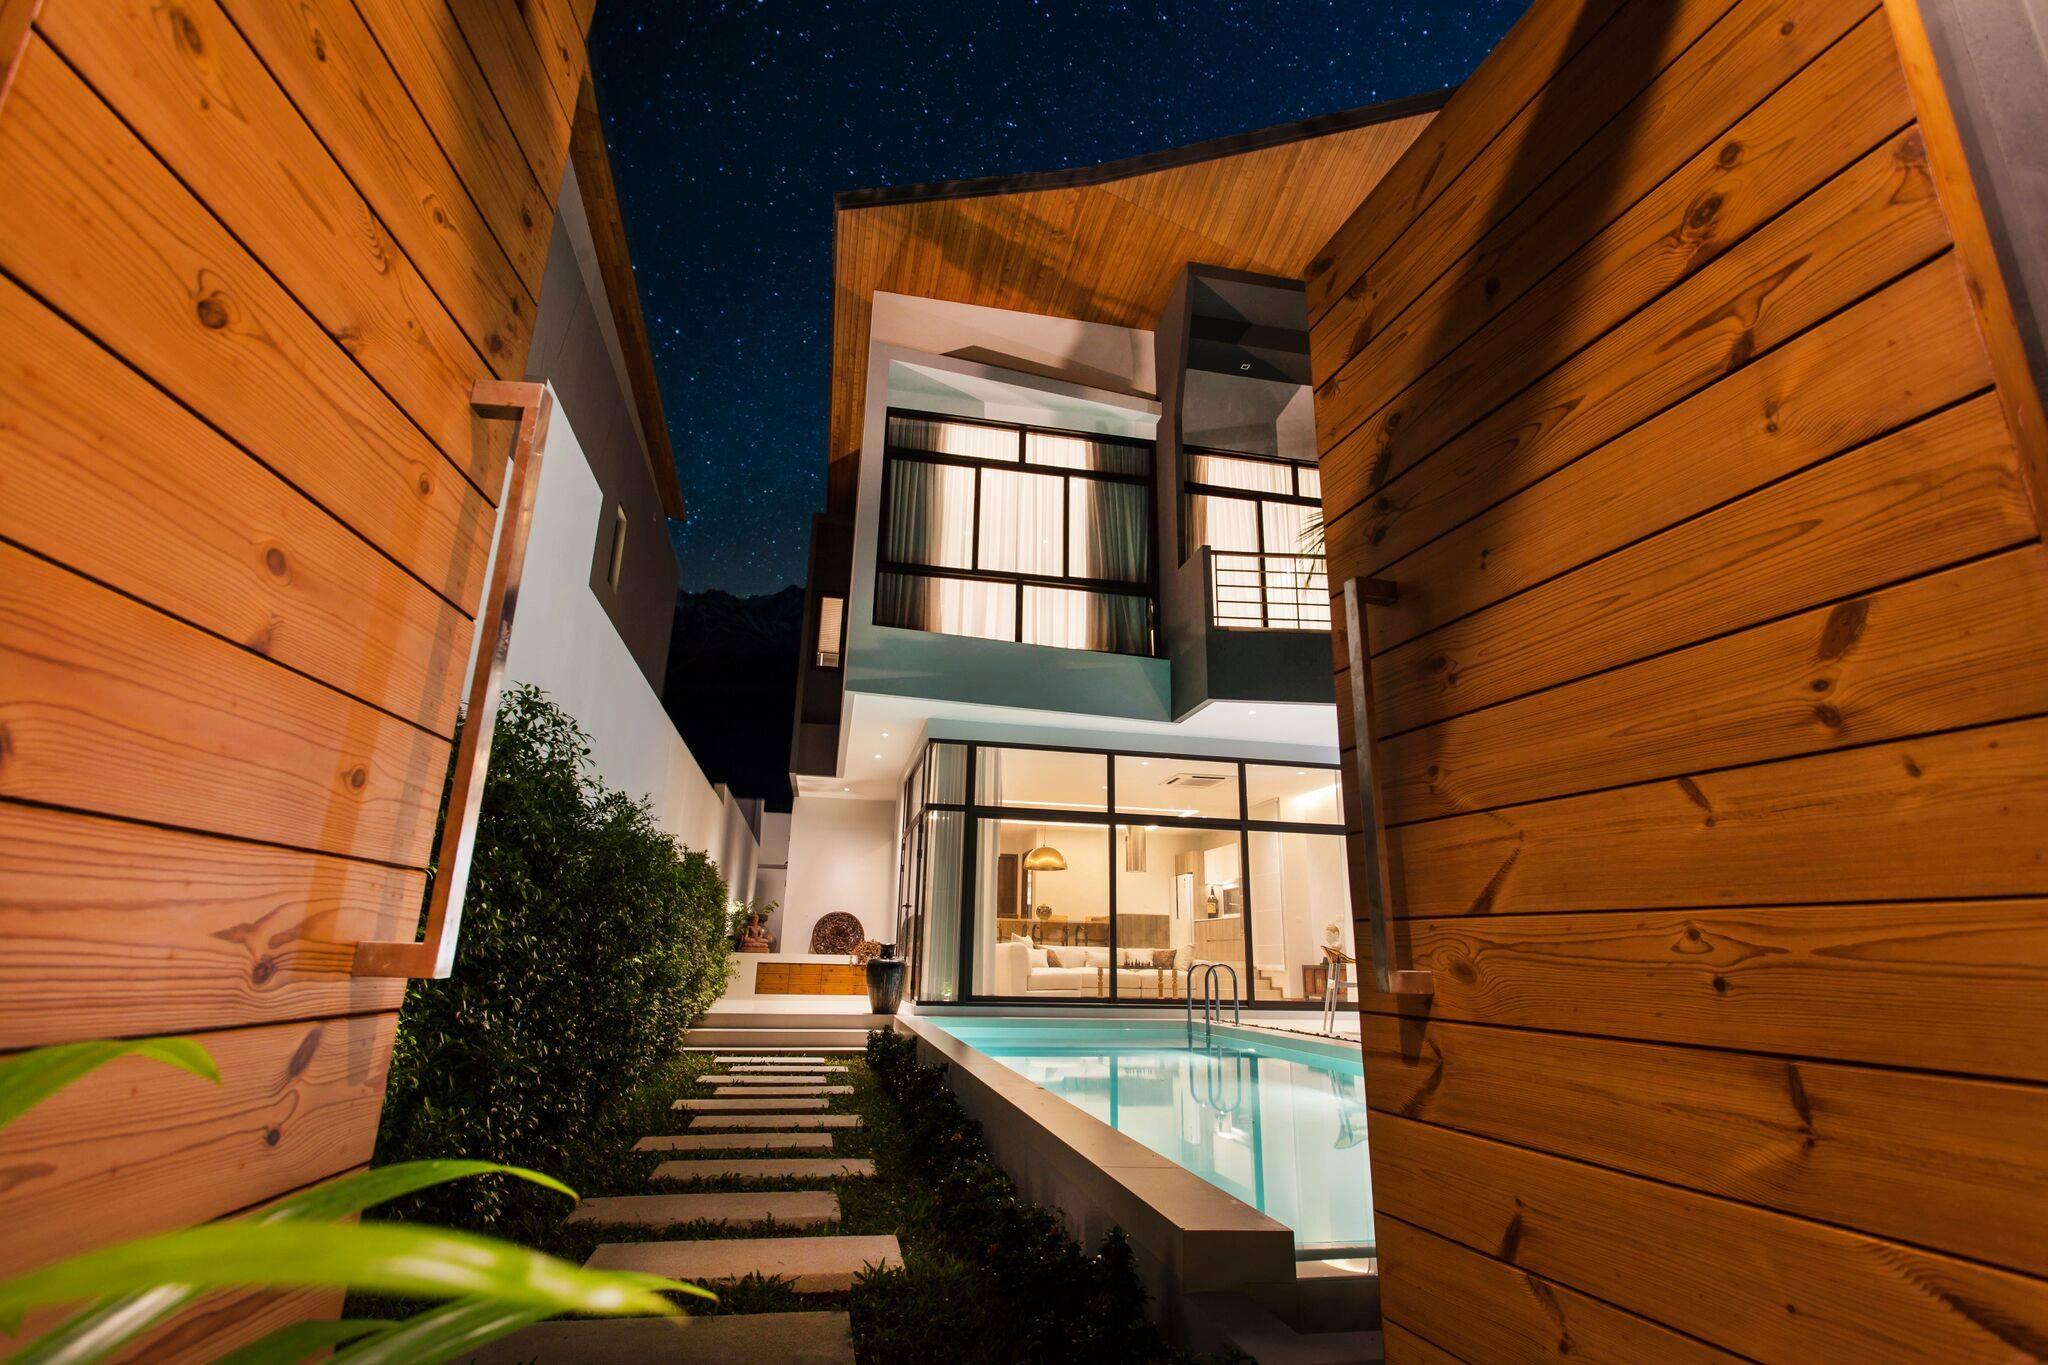 Phuket Real Estate Agency – Nai Harn Beach (38)